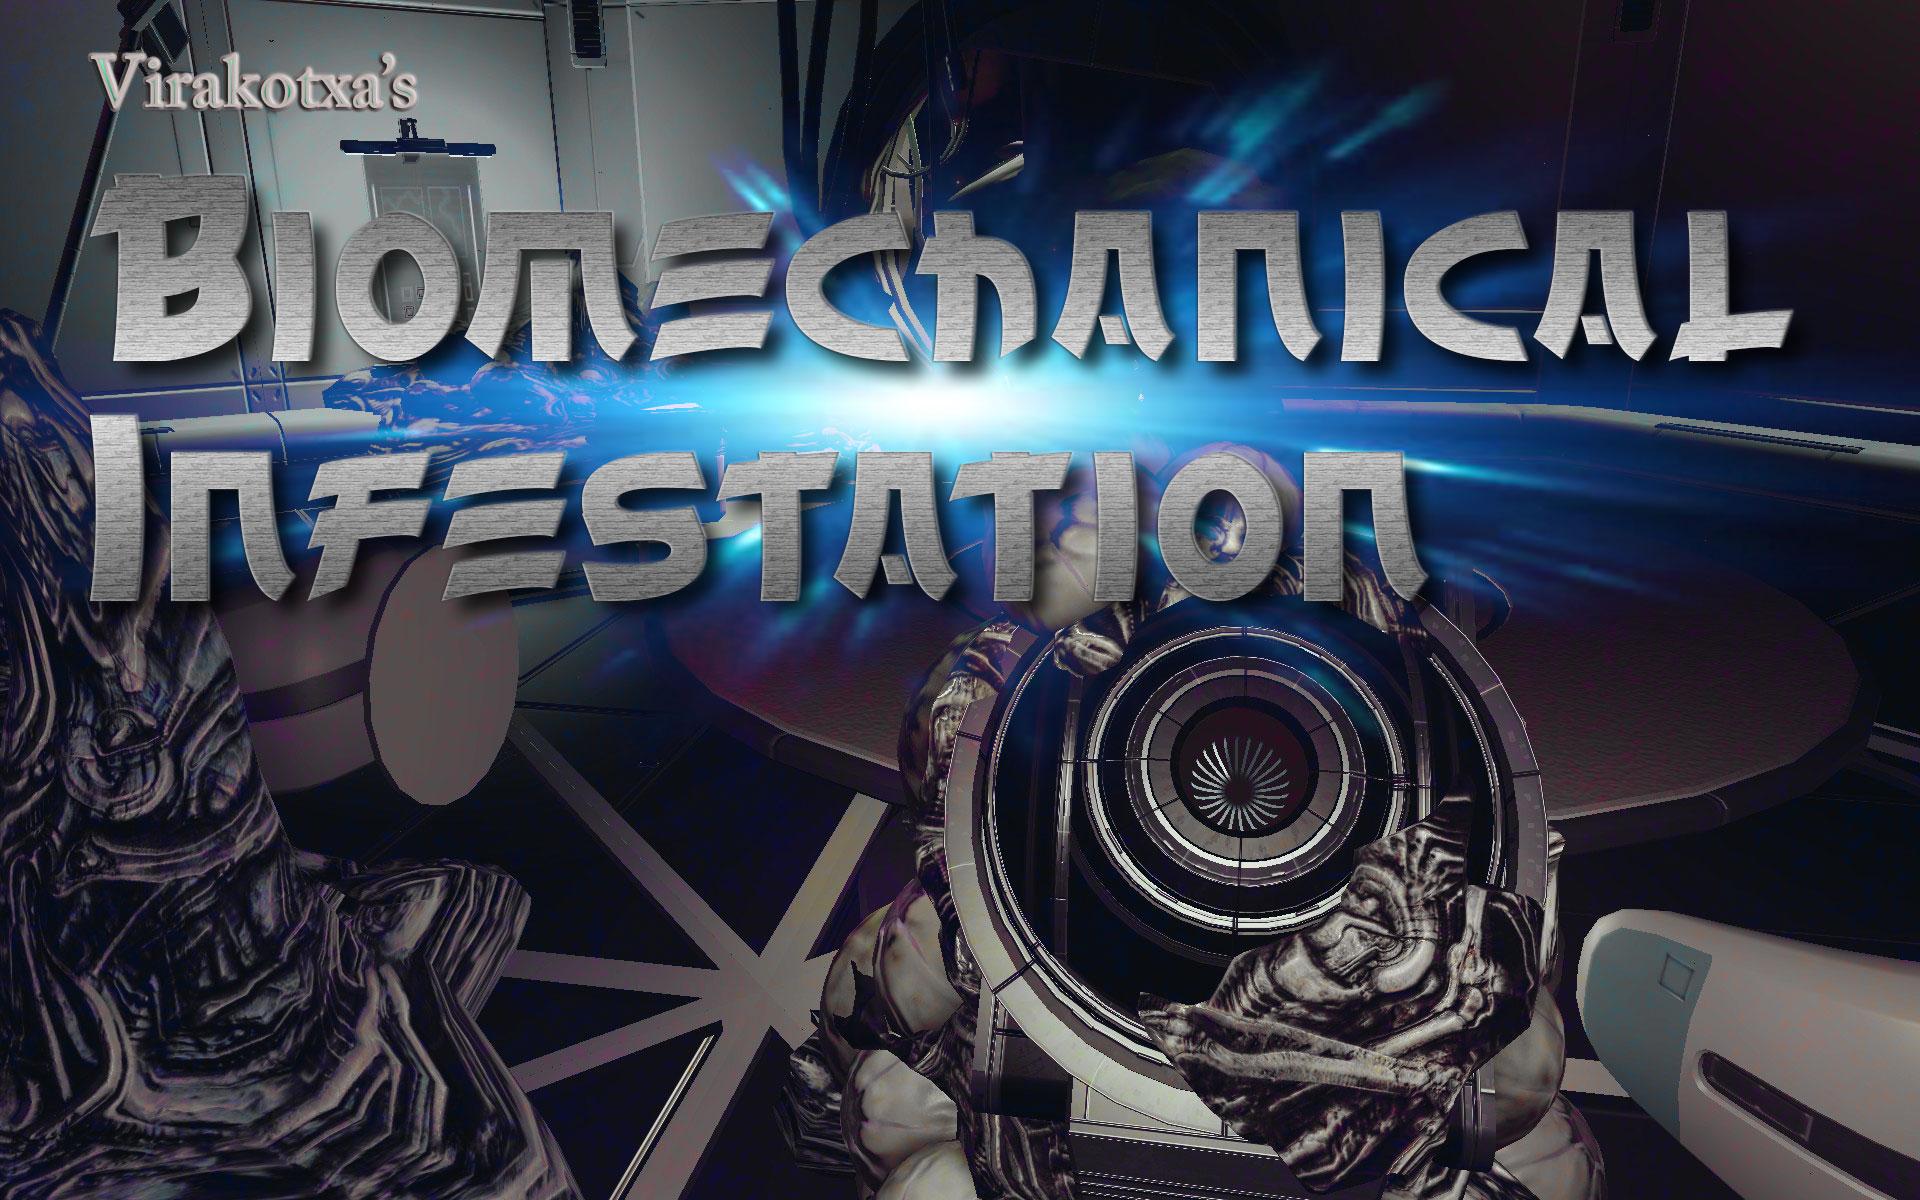 Biomechanical Infestation